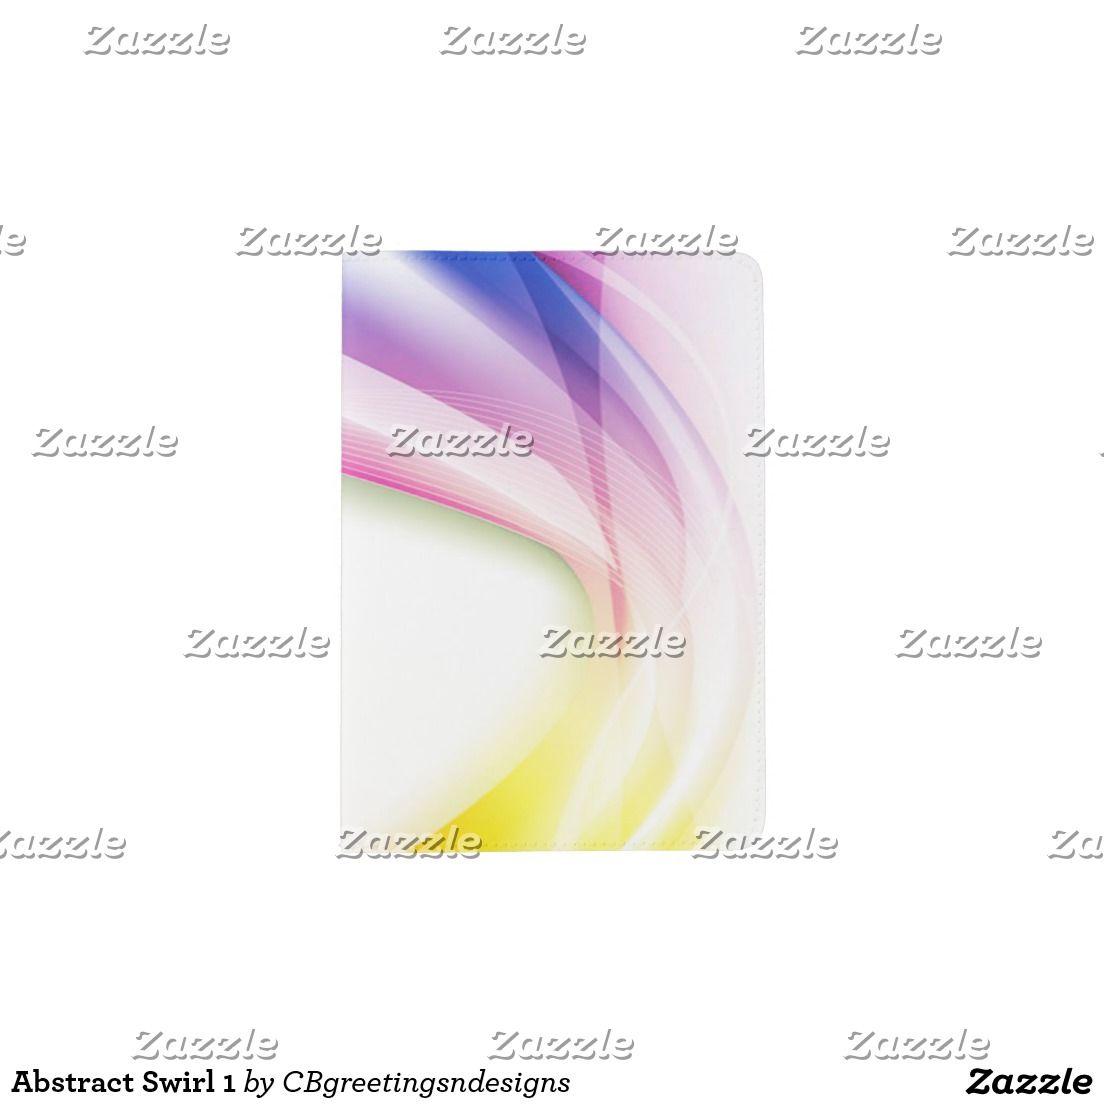 Abstract Swirl 1 Passport Holder